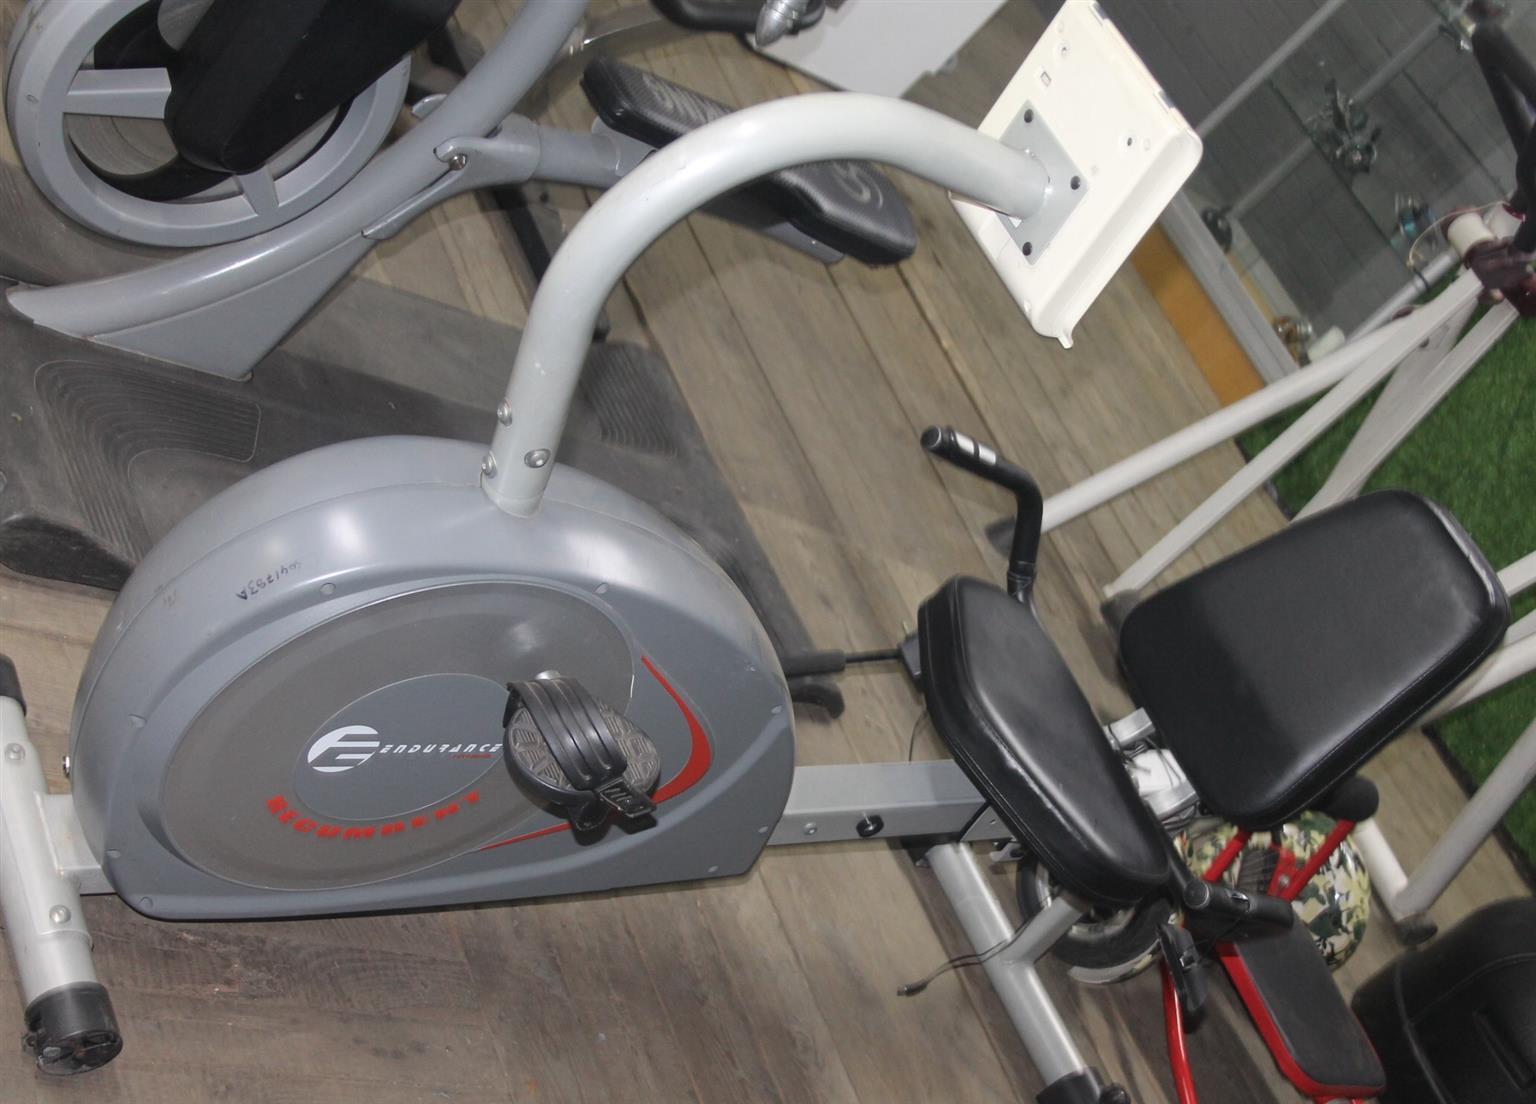 Endurance exercise bike S041783A #Rosettenvillepawnshop